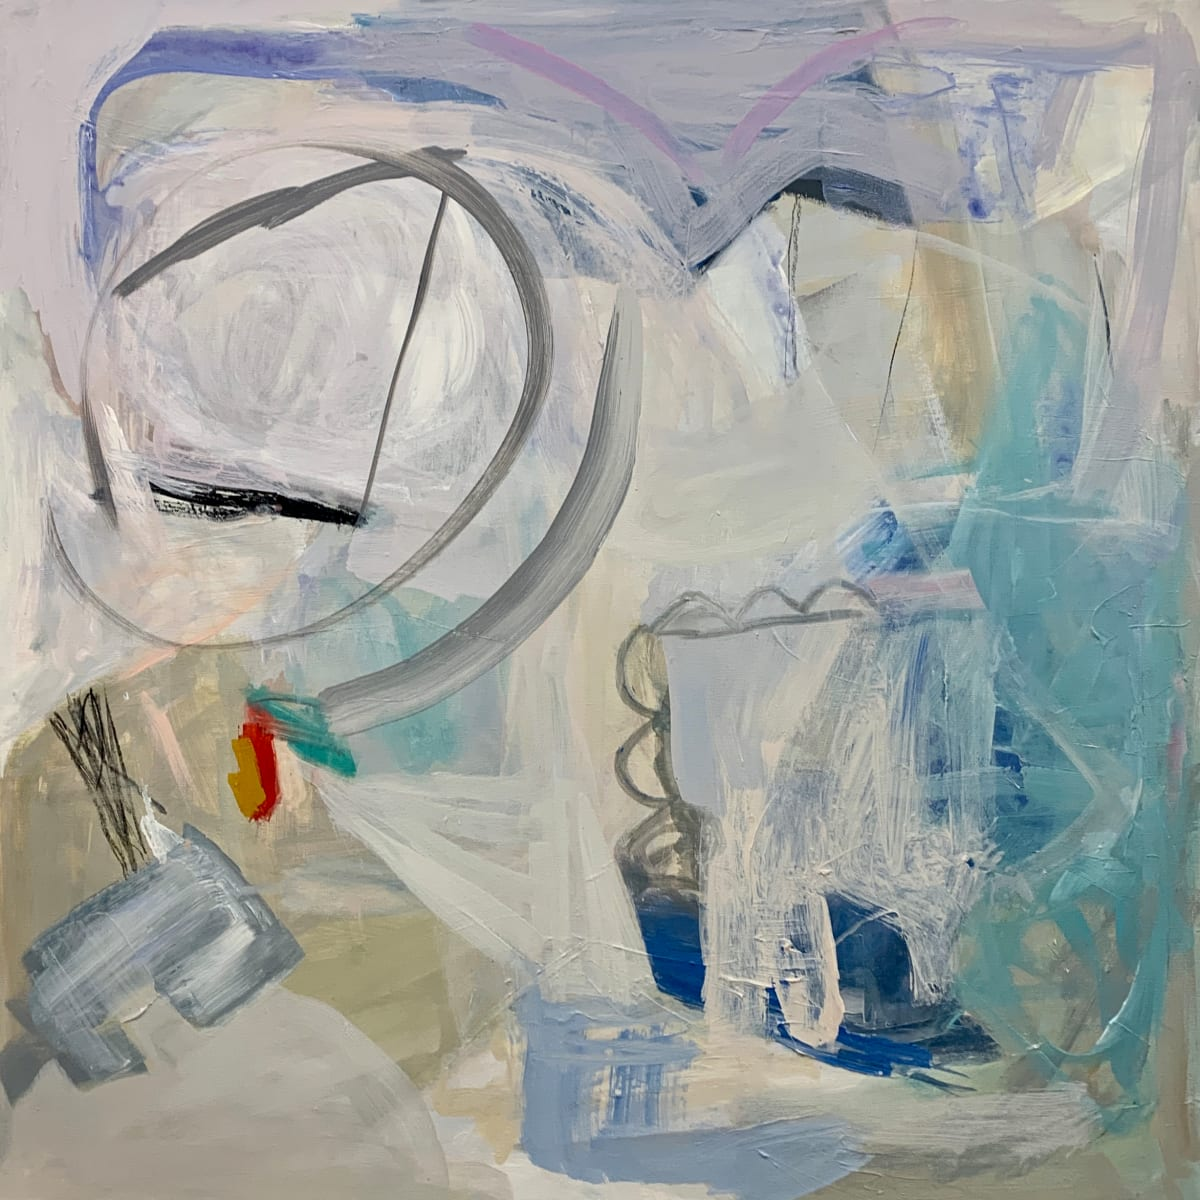 Time Collapsing by Katie Ré Scheidt